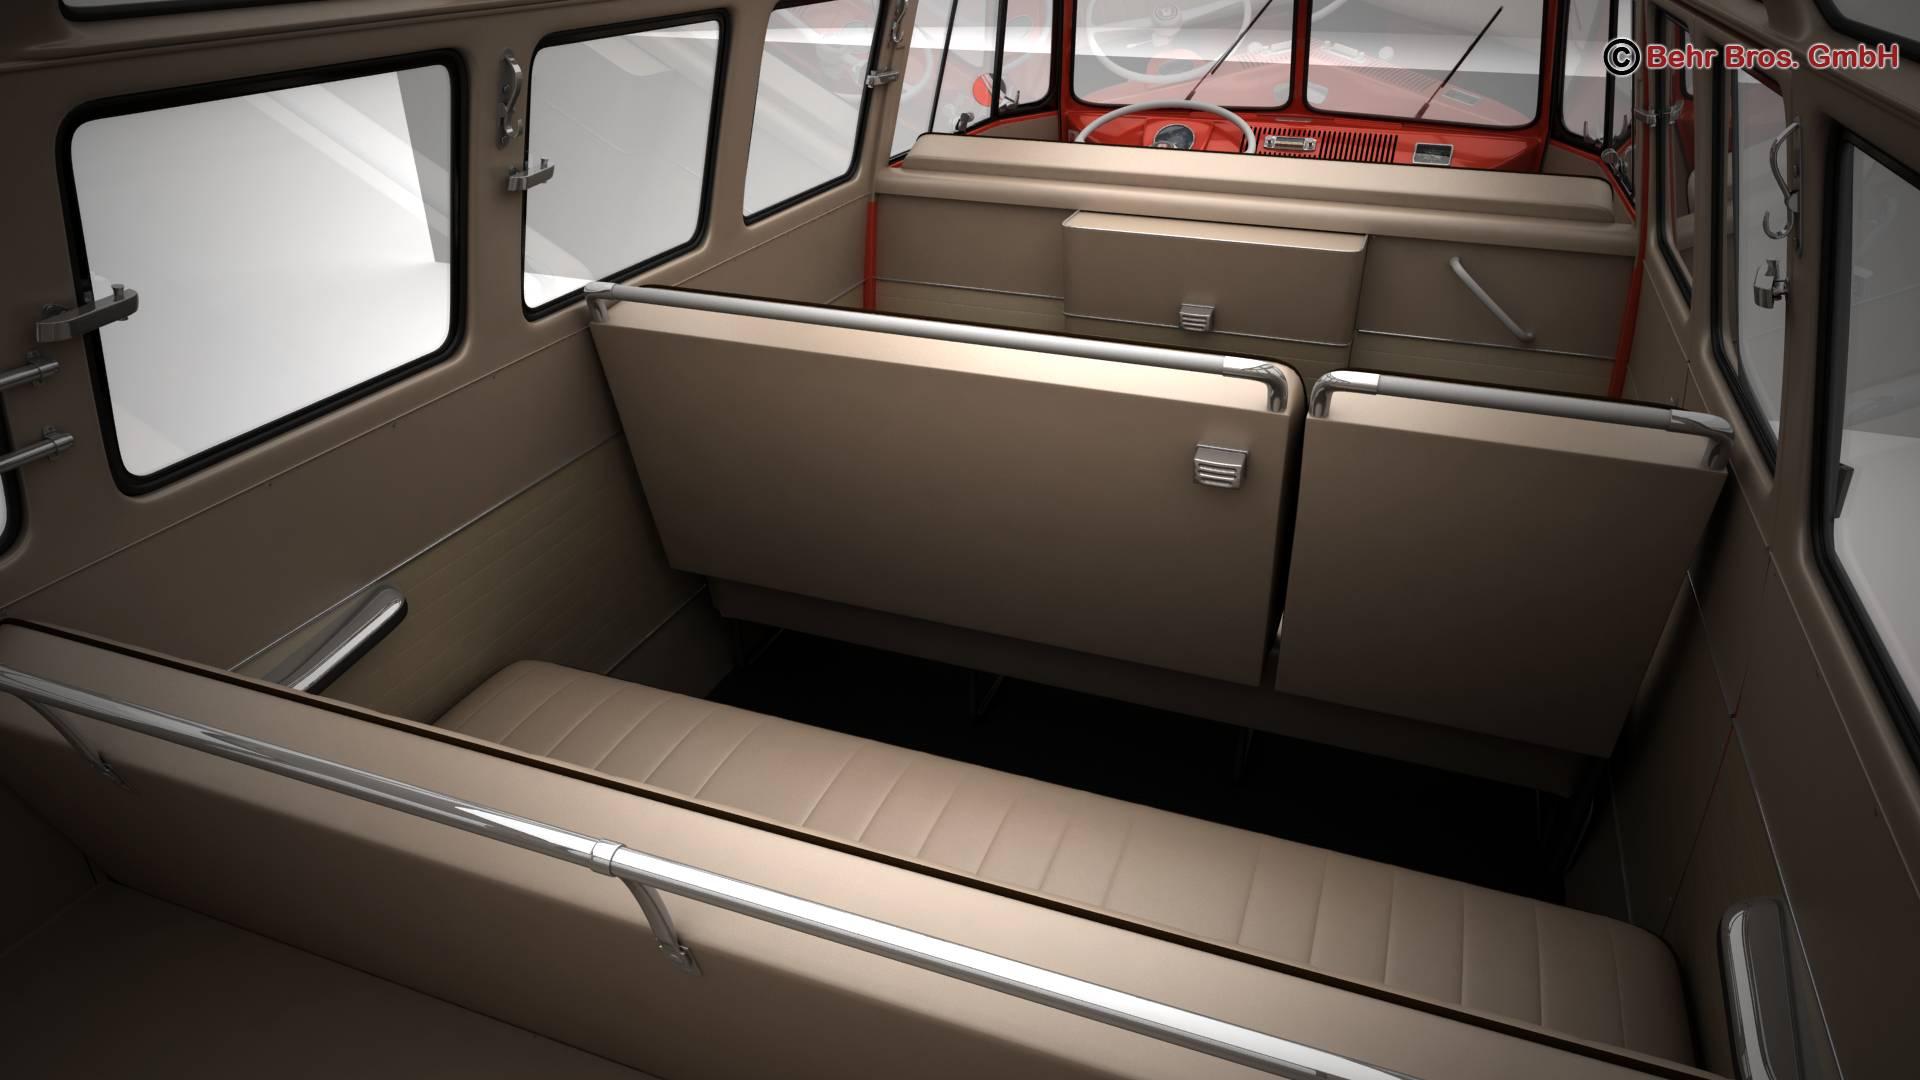 volkswagen type 2 samba 1959 3d model 3ds max fbx c4d lwo ma mb obj 217120